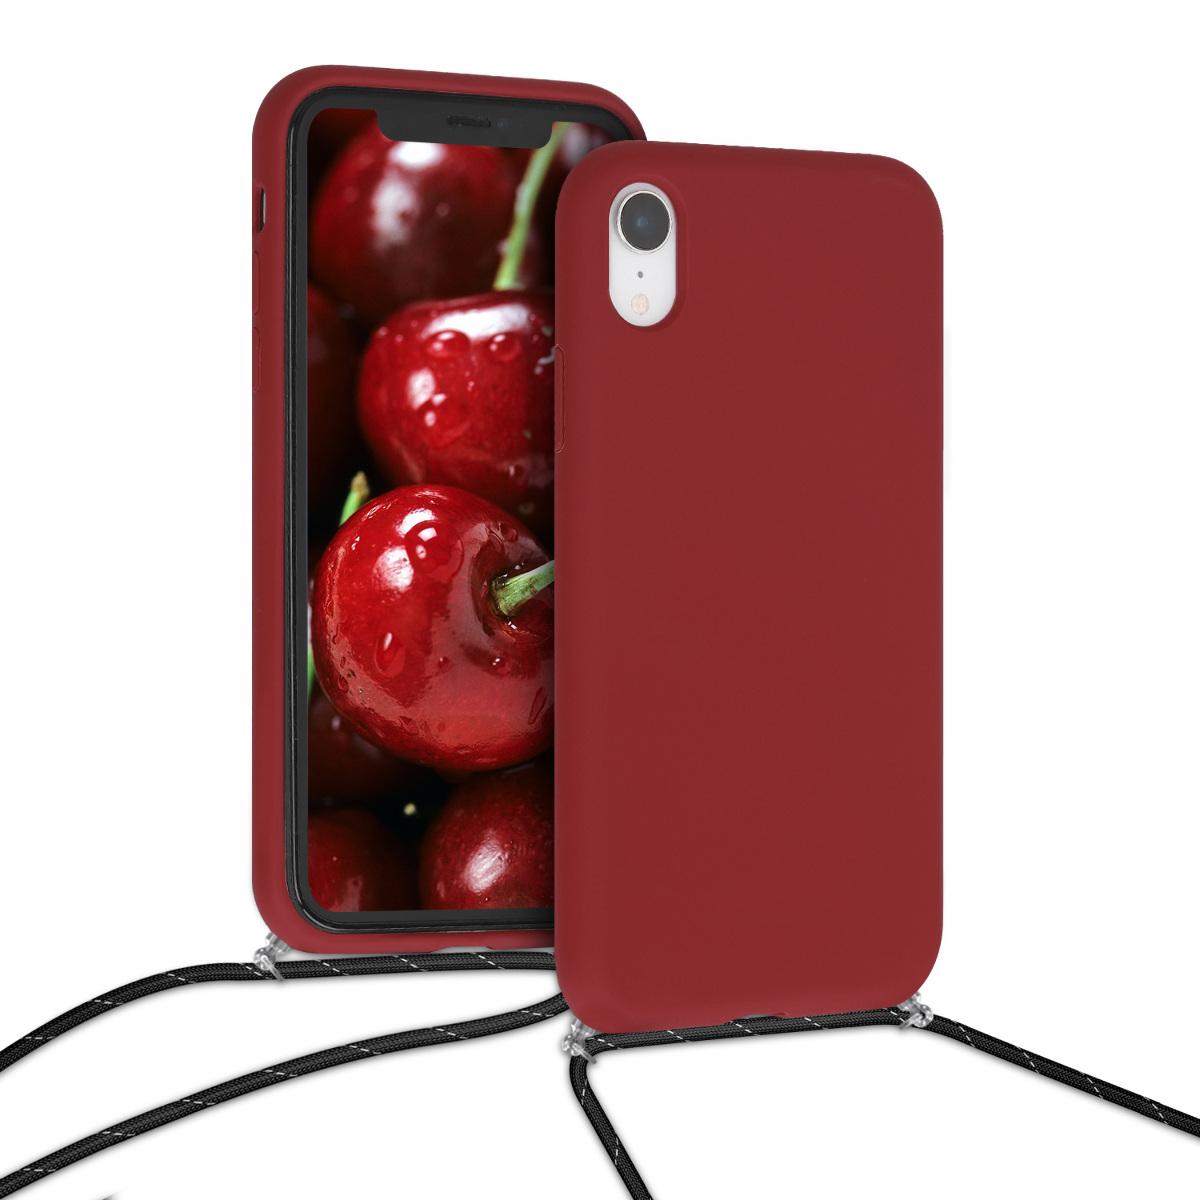 KW Θήκη Σιλικόνης με Λουράκι Λαιμού Apple iPhone XR - Dark Red (50418.20)